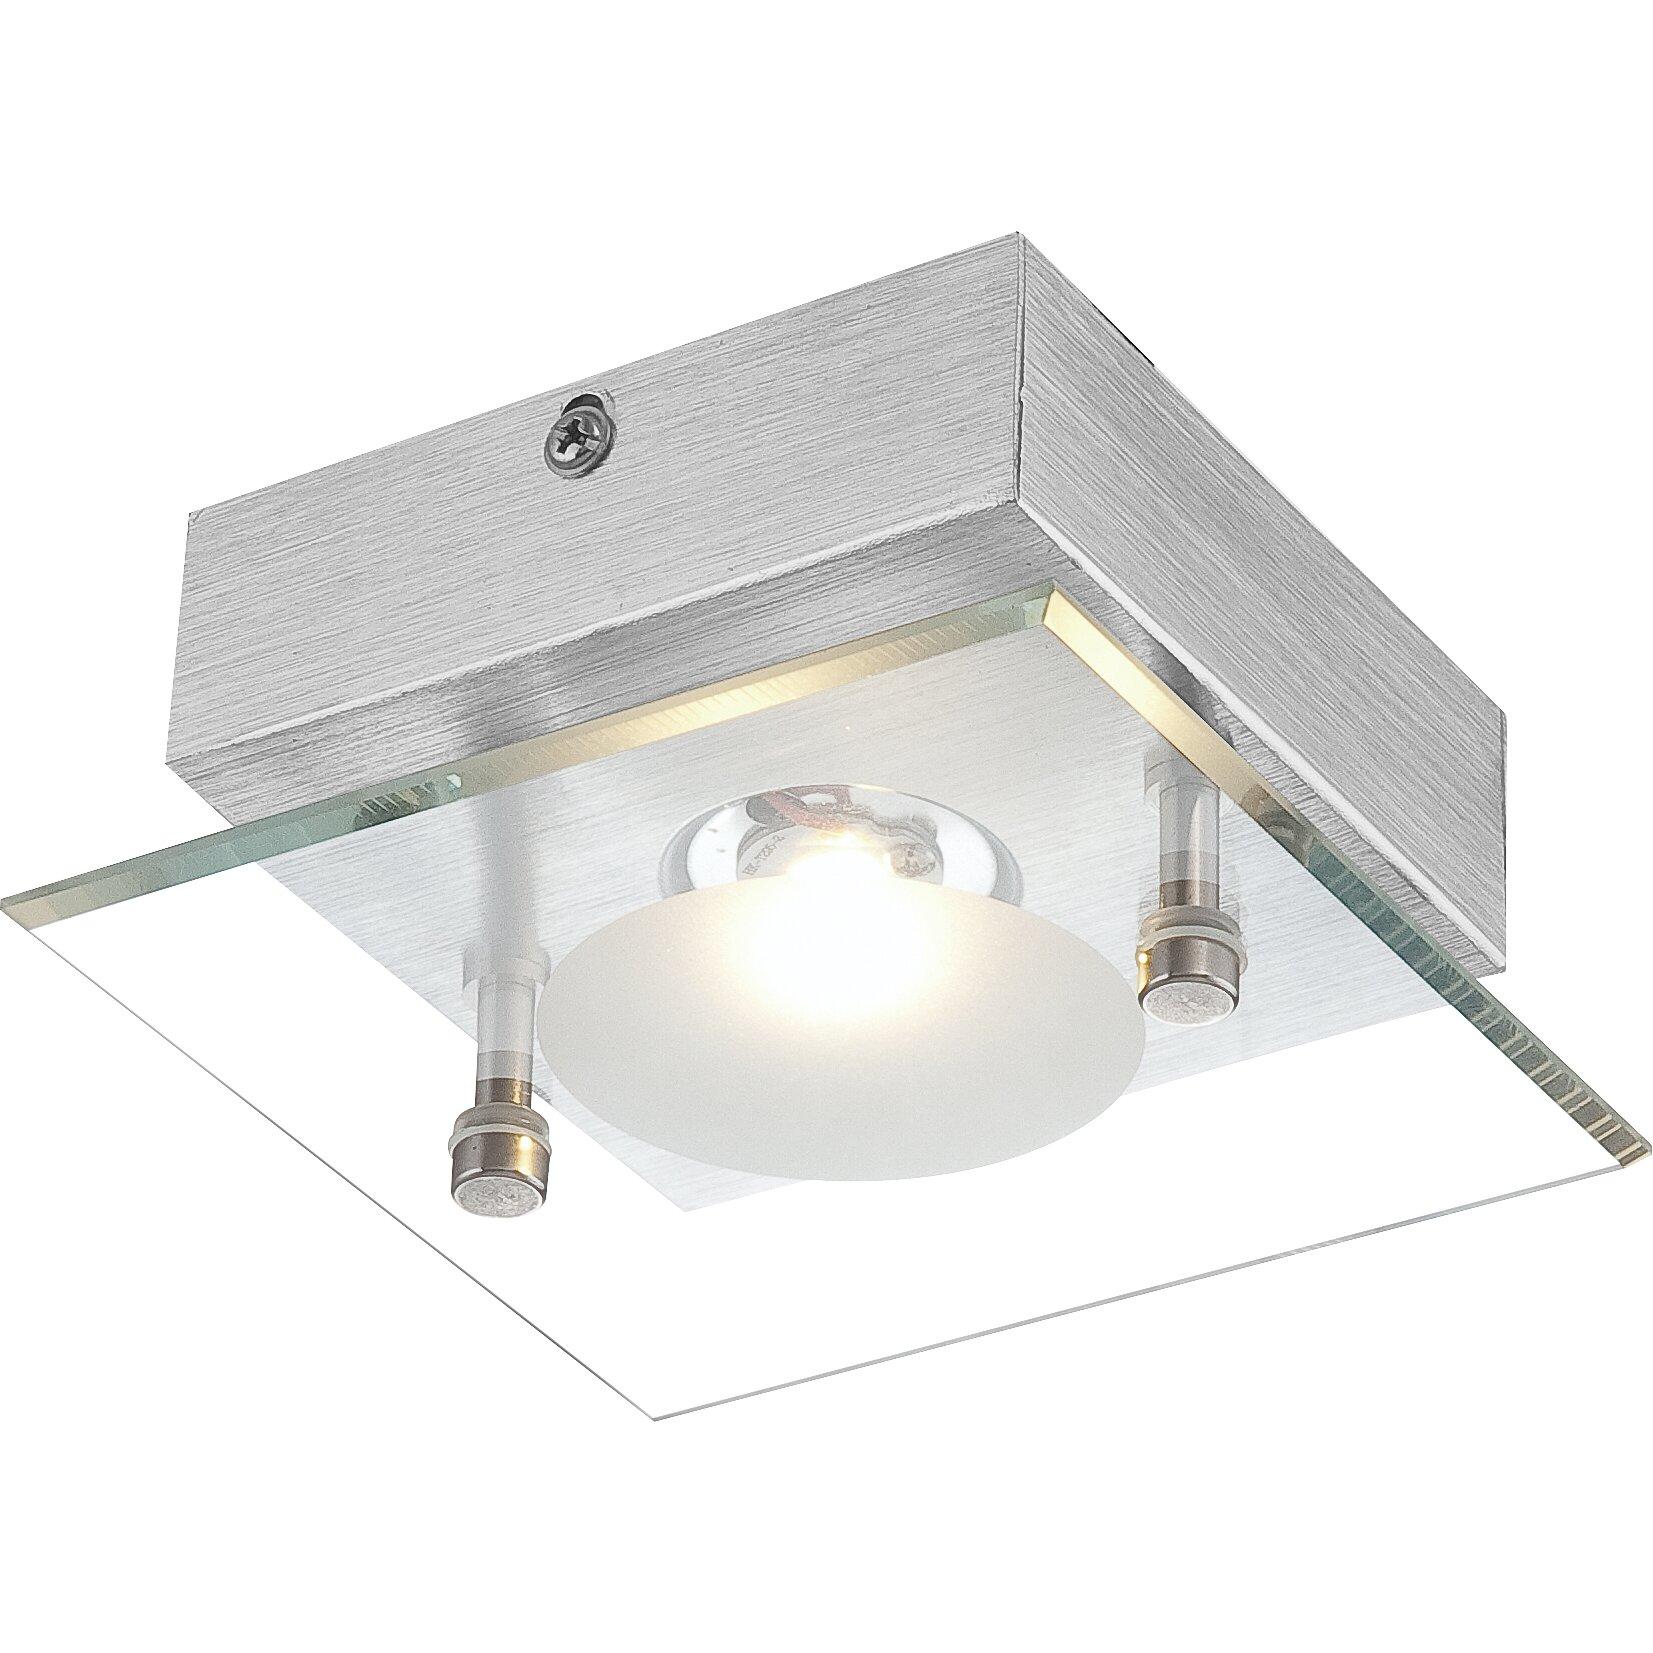 home essence deckenlampe 1 flammig berto bewertungen. Black Bedroom Furniture Sets. Home Design Ideas